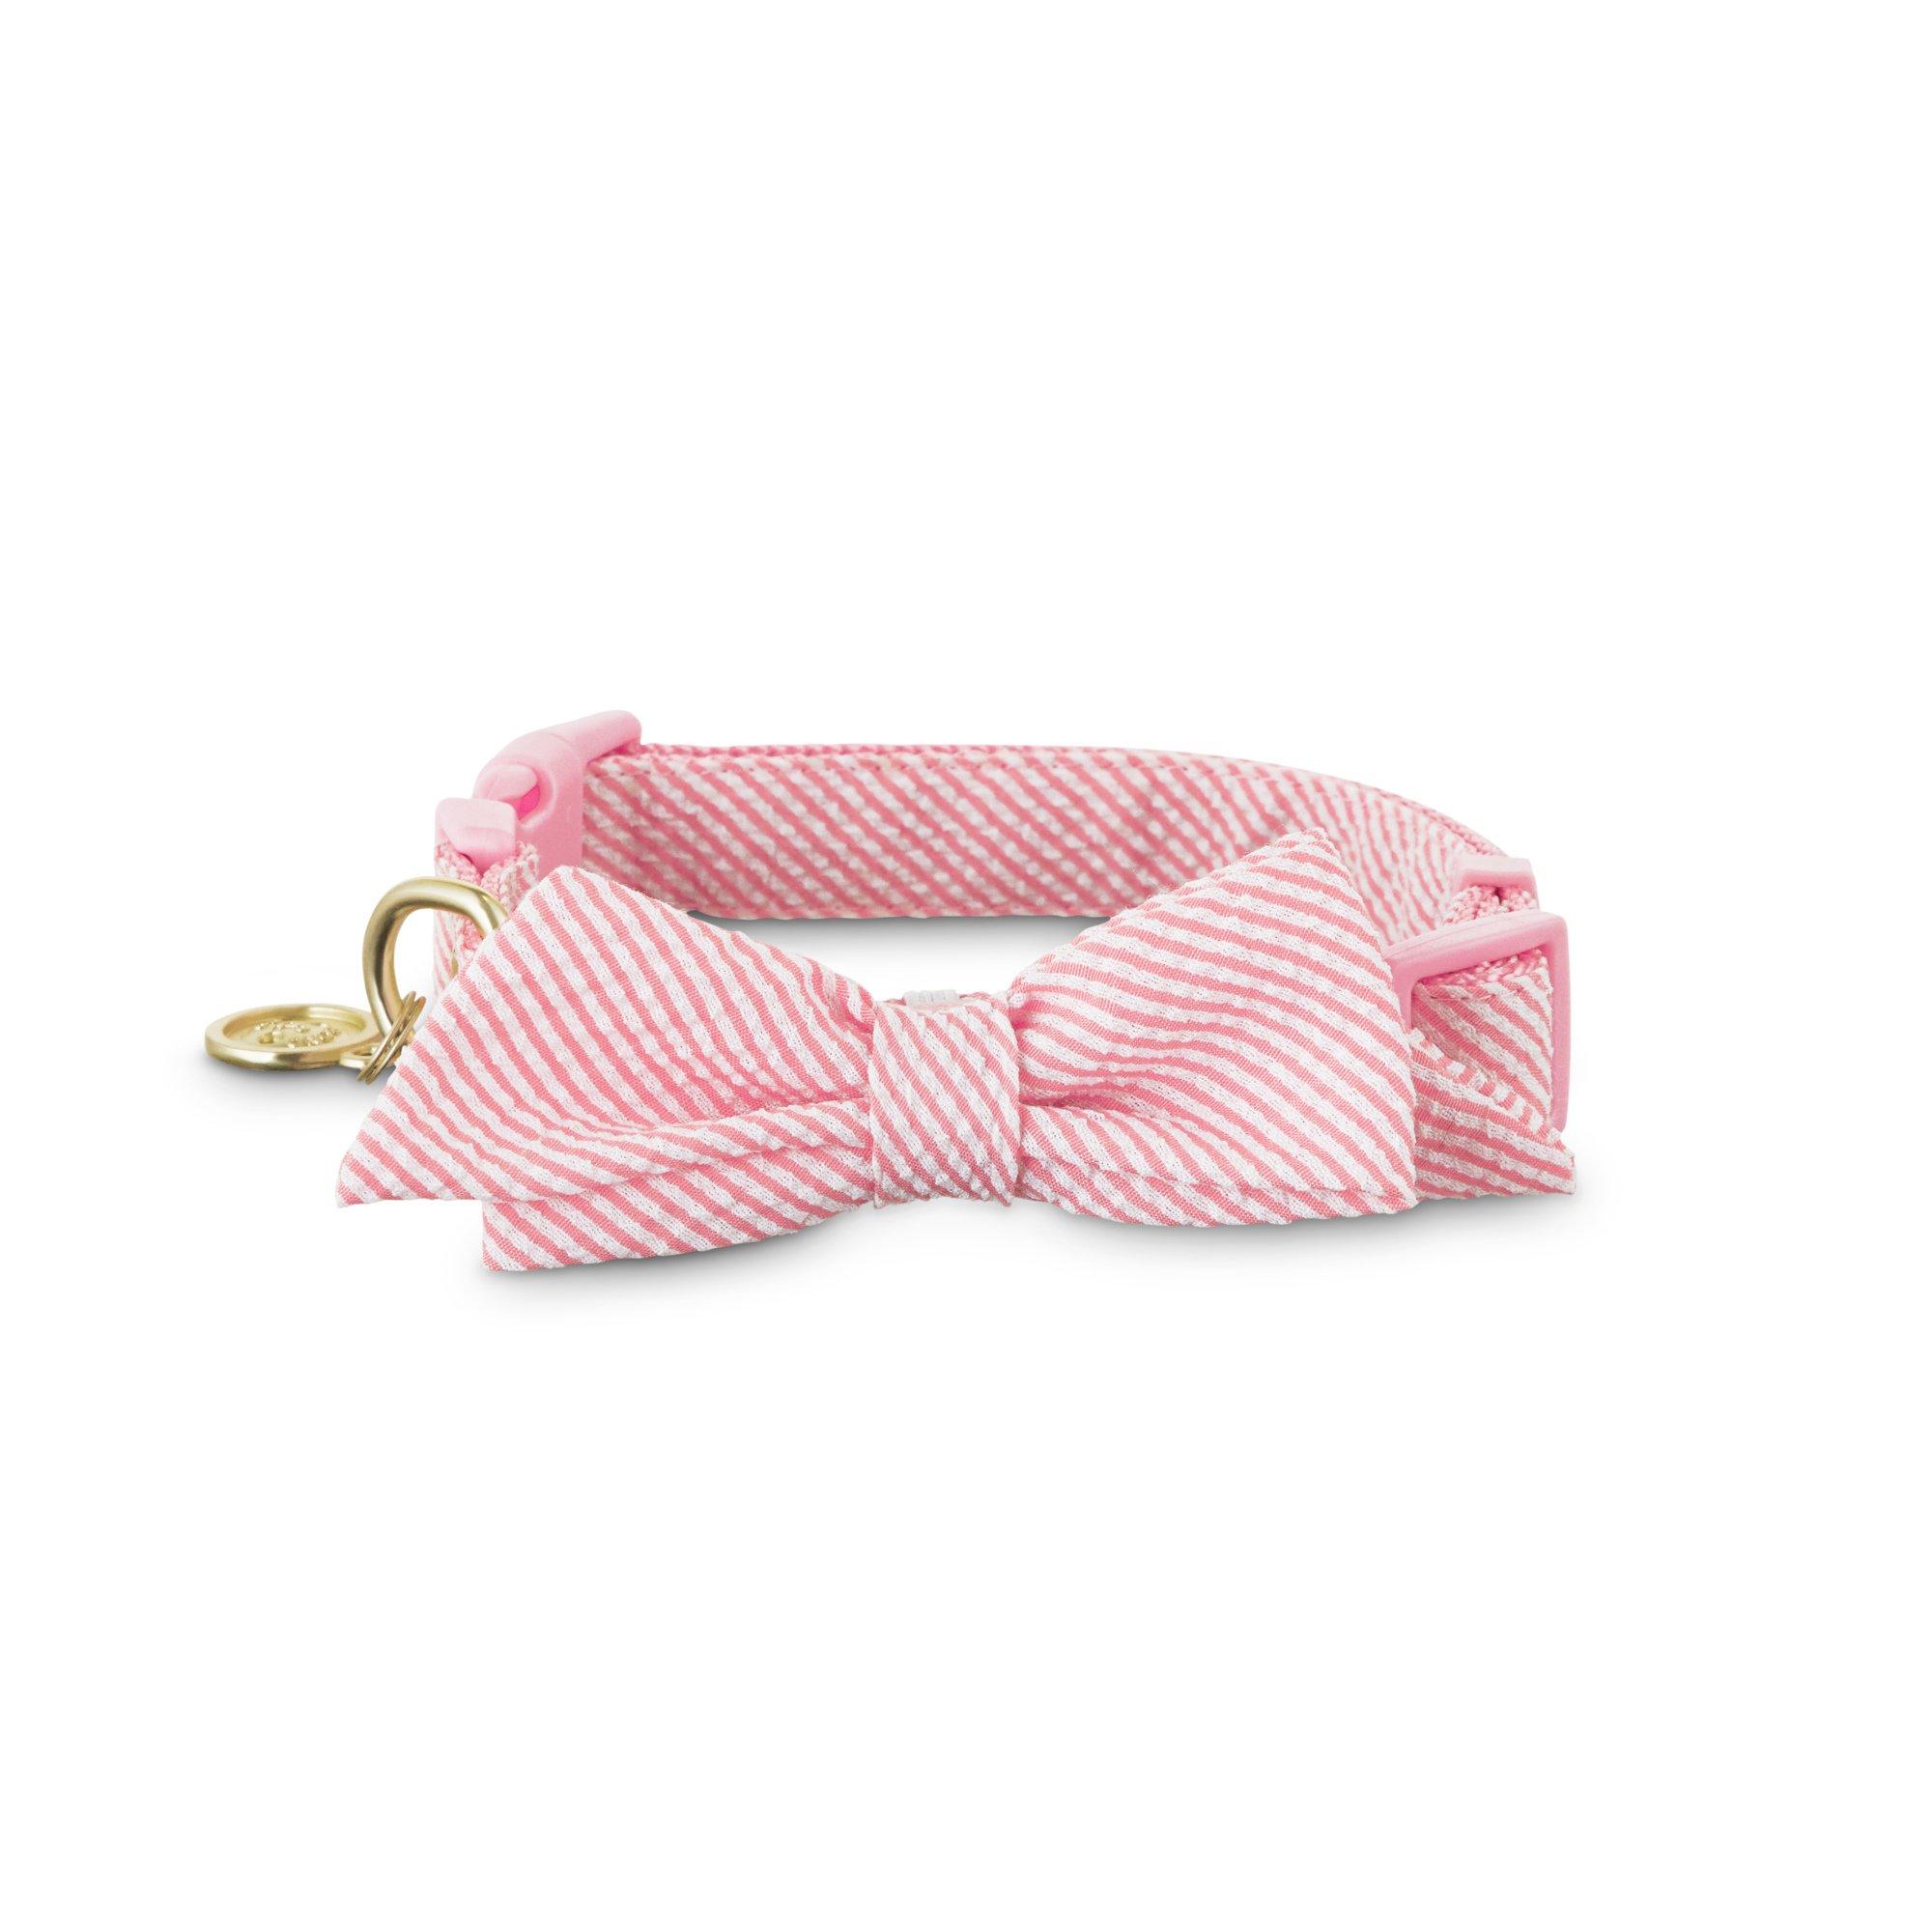 Bond & Co. Pink Seersucker Bow Tie Dog Collar | Petco at Petco in Braselton, GA | Tuggl